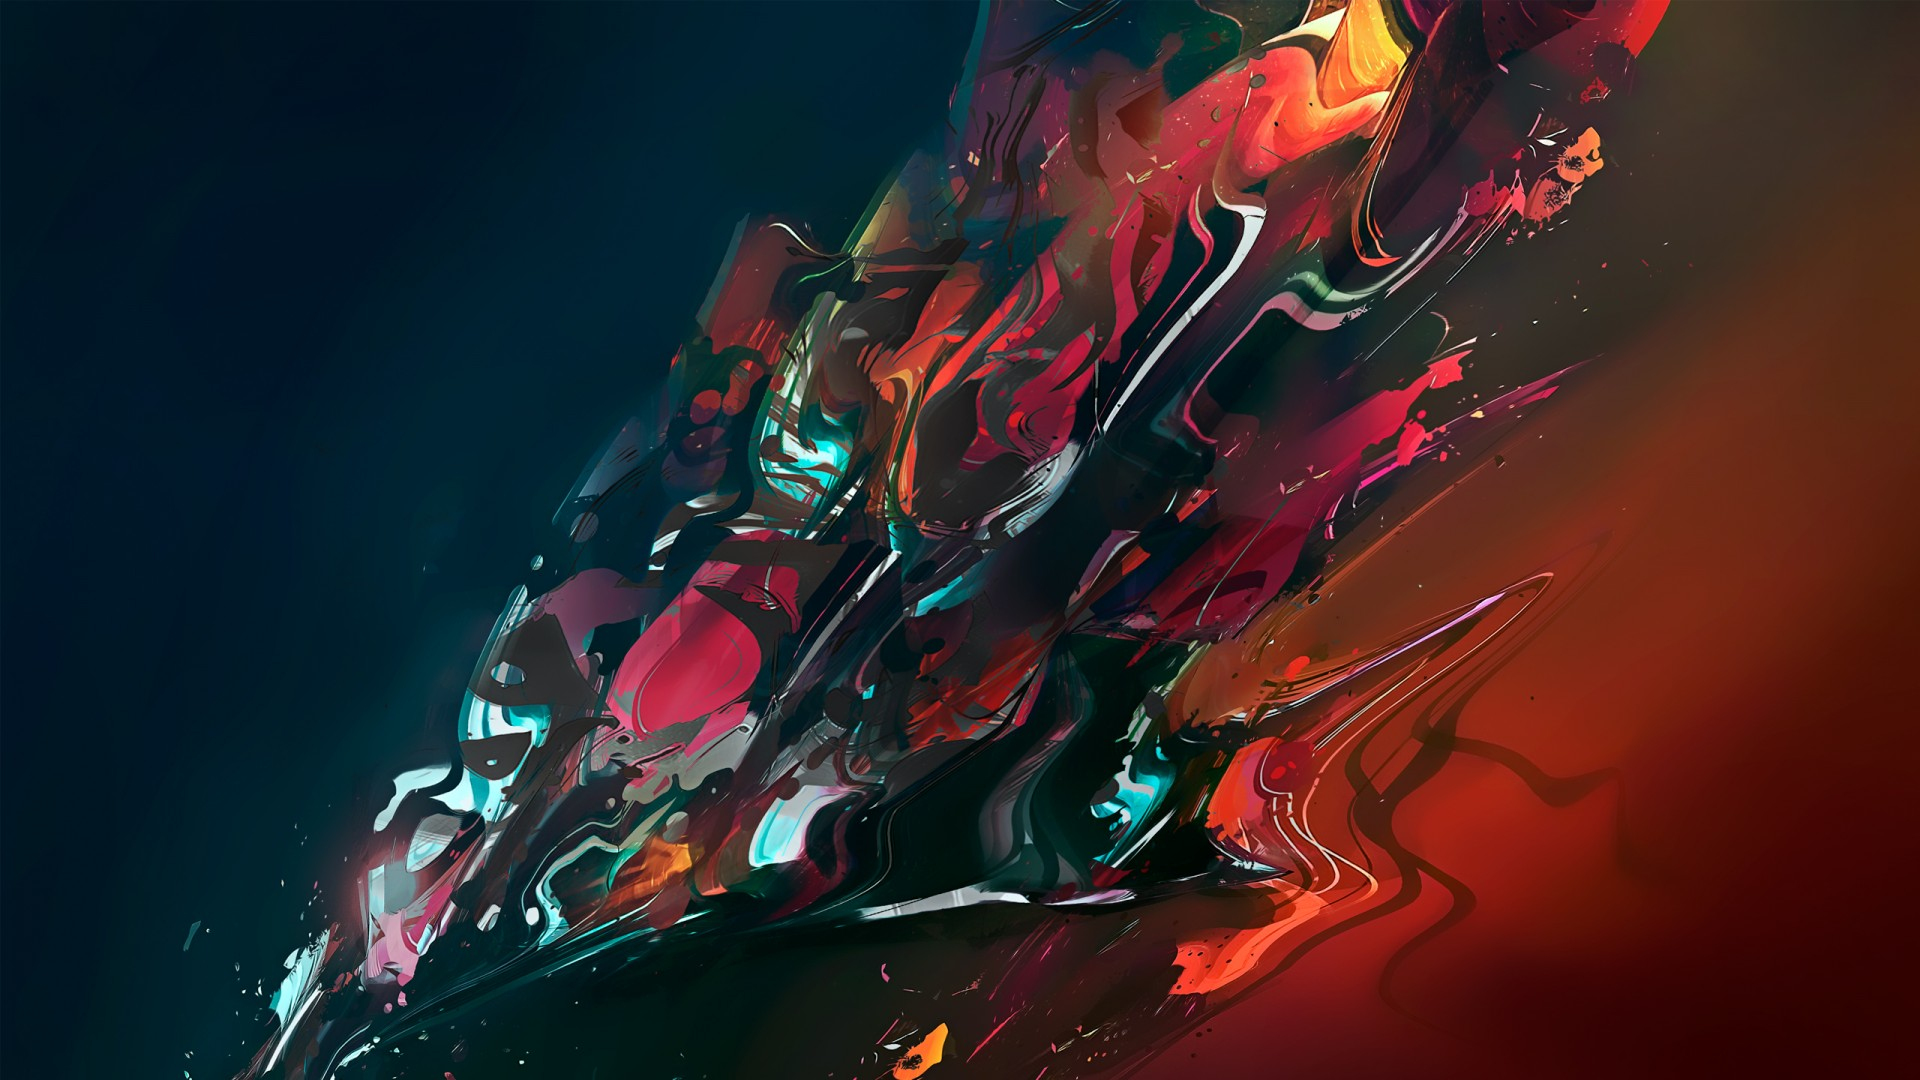 Amazing Wallpaper Marvel Abstract - modern-hd-wallpapers-3  2018_29049.jpg